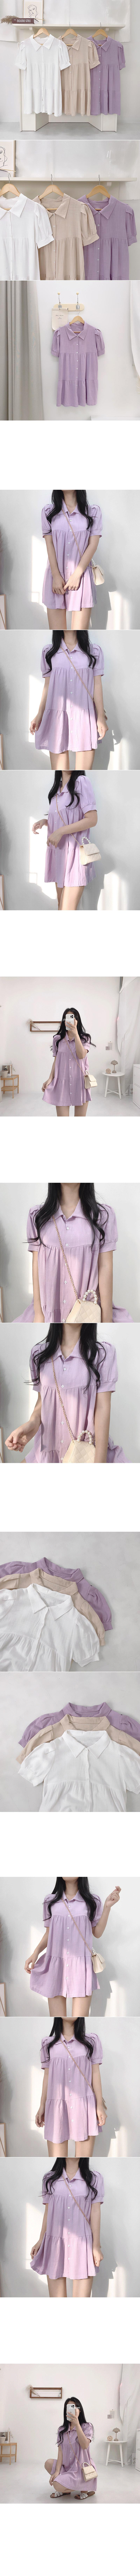 Nanning puff collar Dress